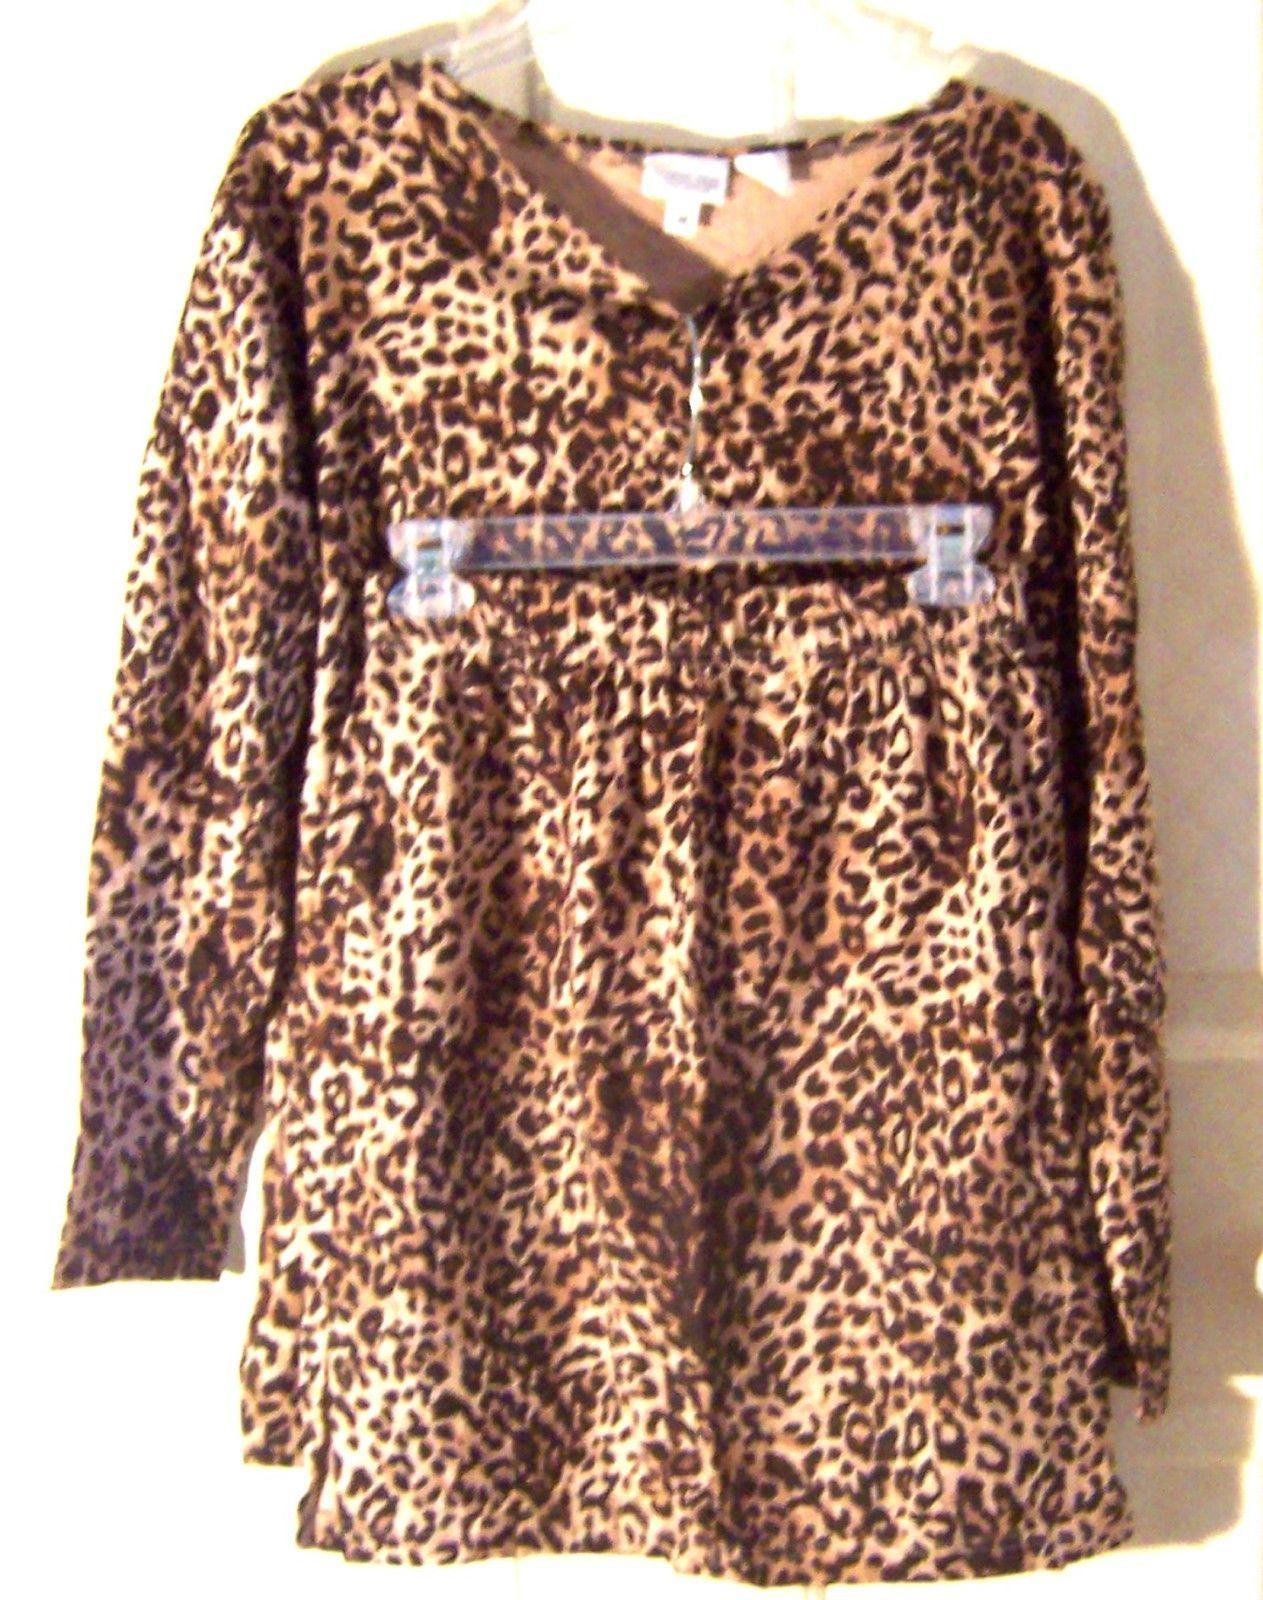 Newport News Animal Print Long Sleeve Top and Skirt Set Size Medium  - $47.49